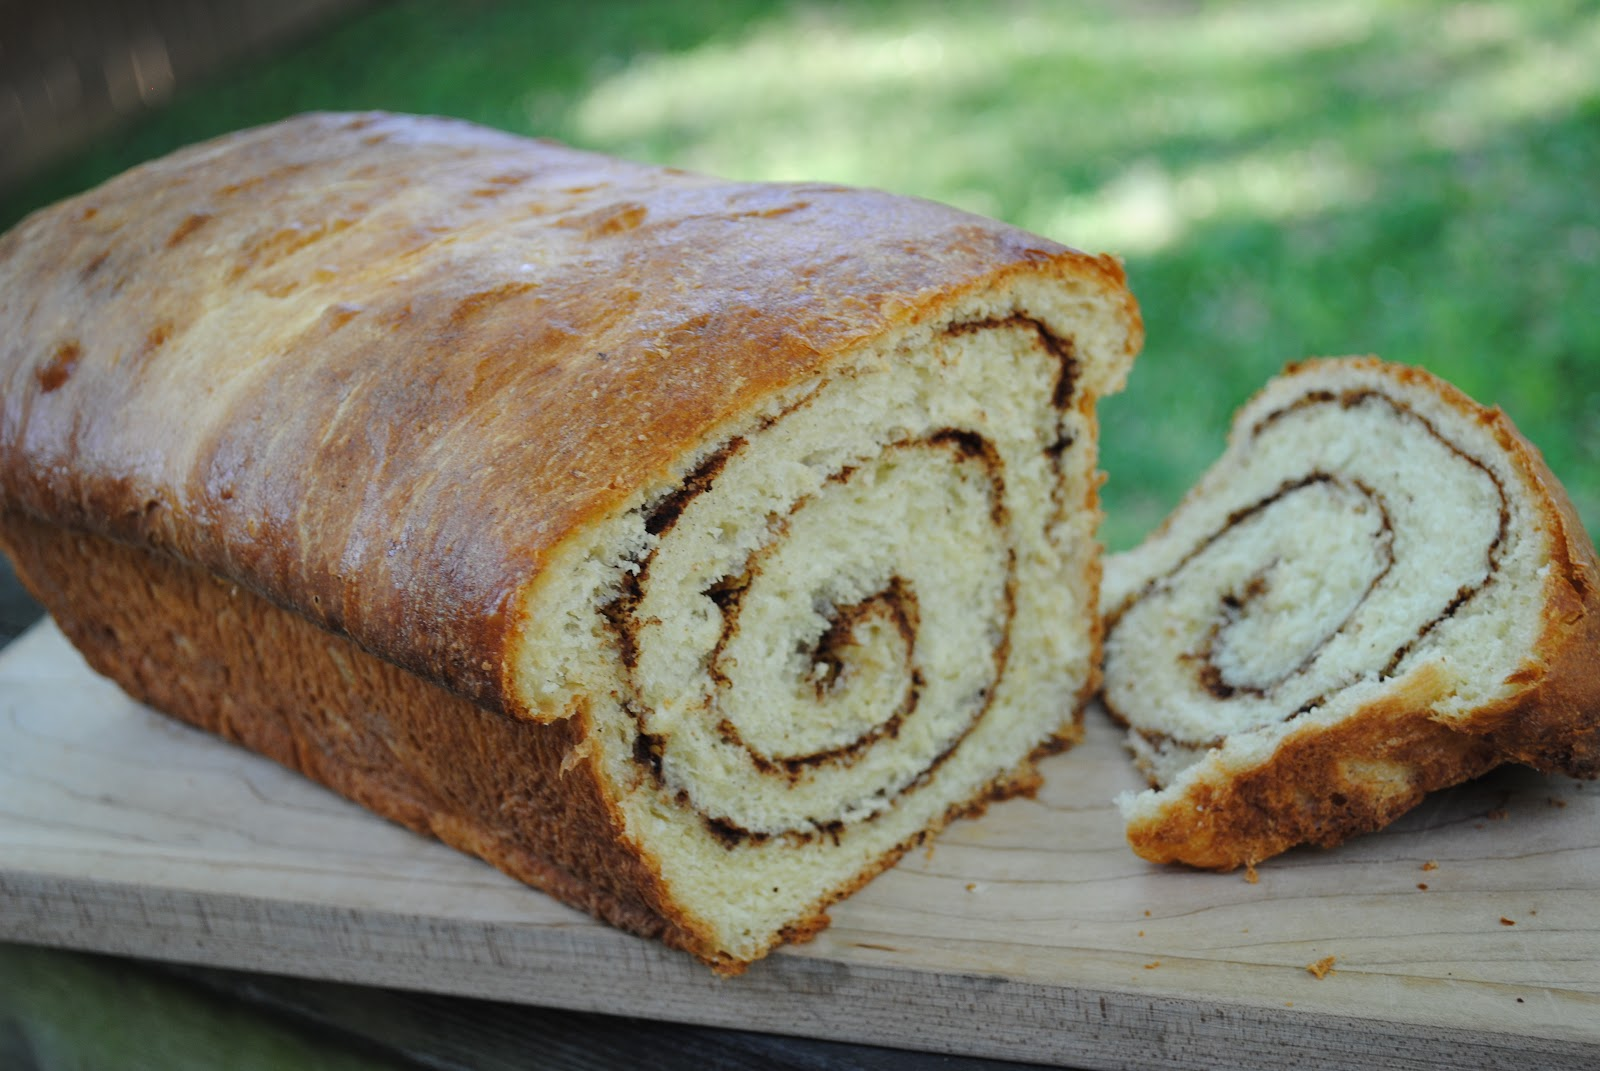 Minnesota Bread: Cinnamon Swirl Bread